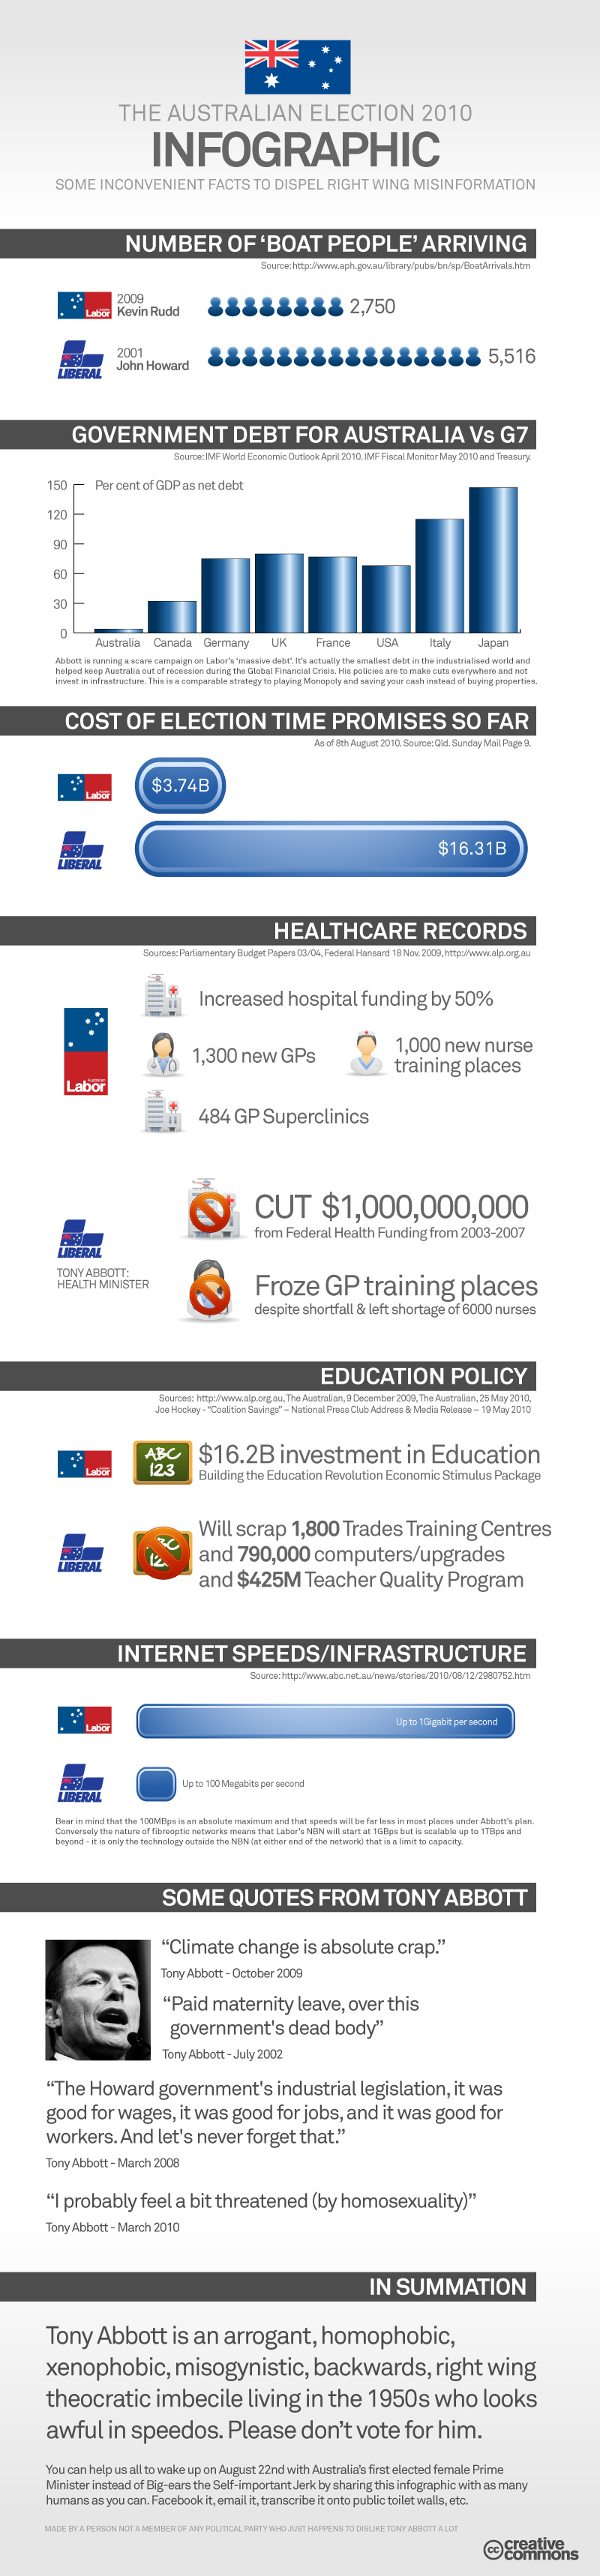 Australian Election InfographicV2